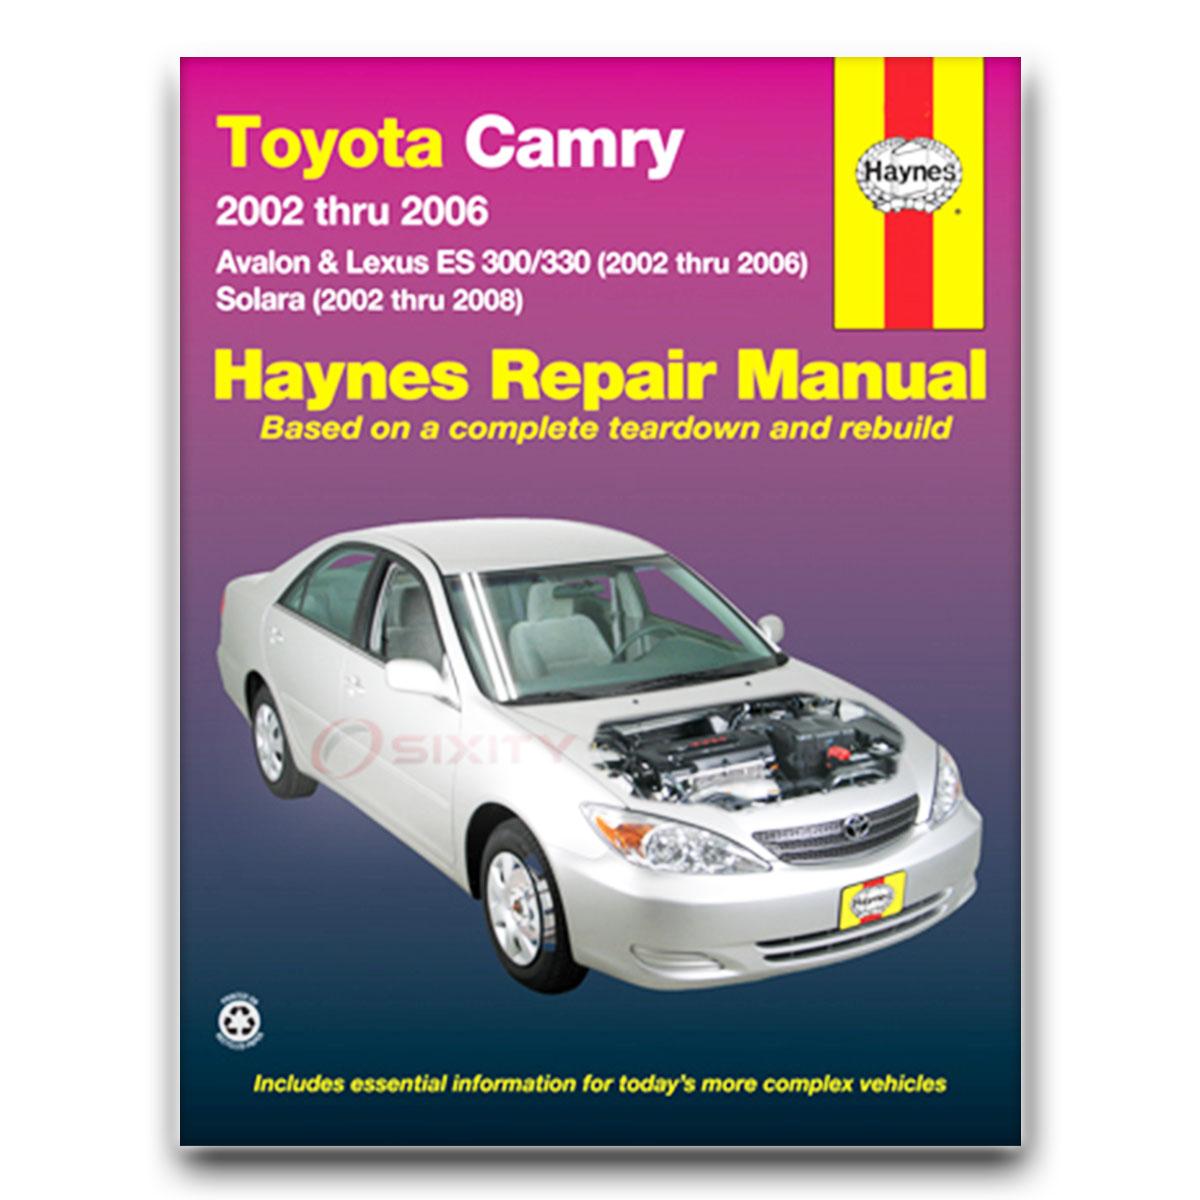 lexus es300 haynes repair manual base shop service garage book iw ebay rh ebay com Lexus Hatch es300h owners manual pdf